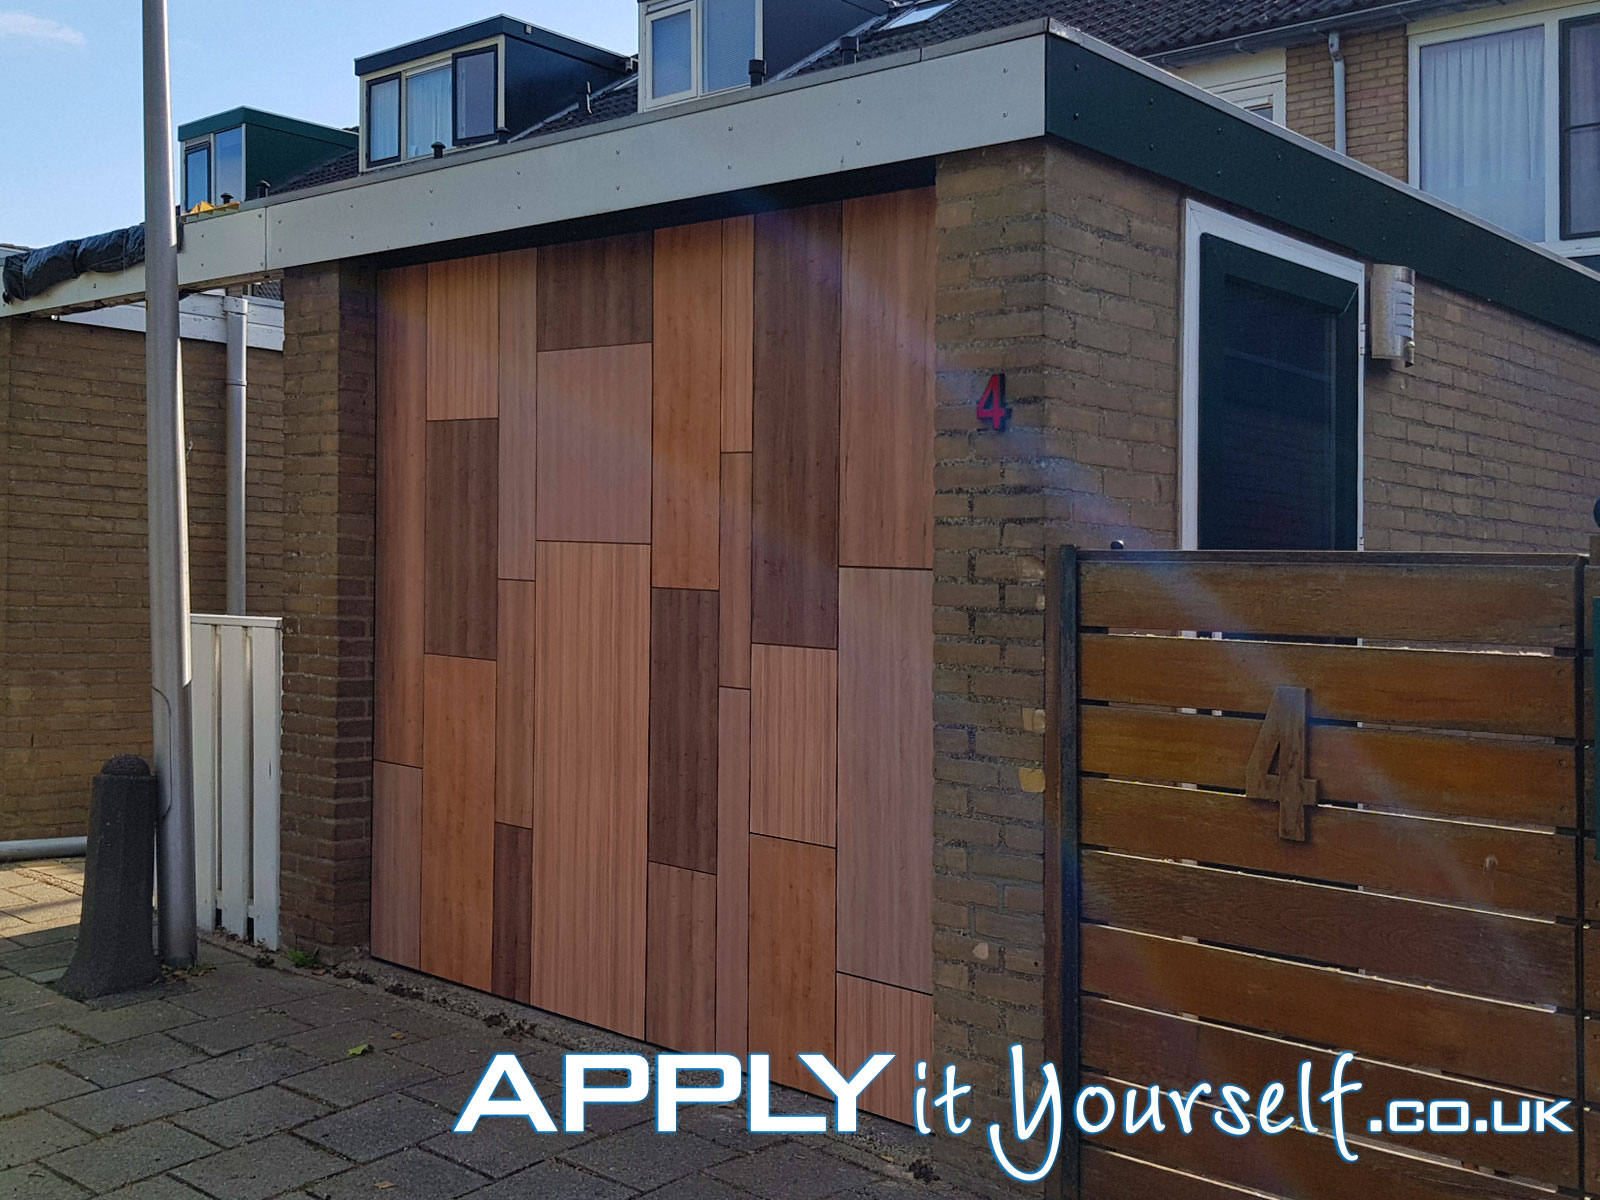 wall sticker, bespoke, large, outdoor, garage door, wood pattern